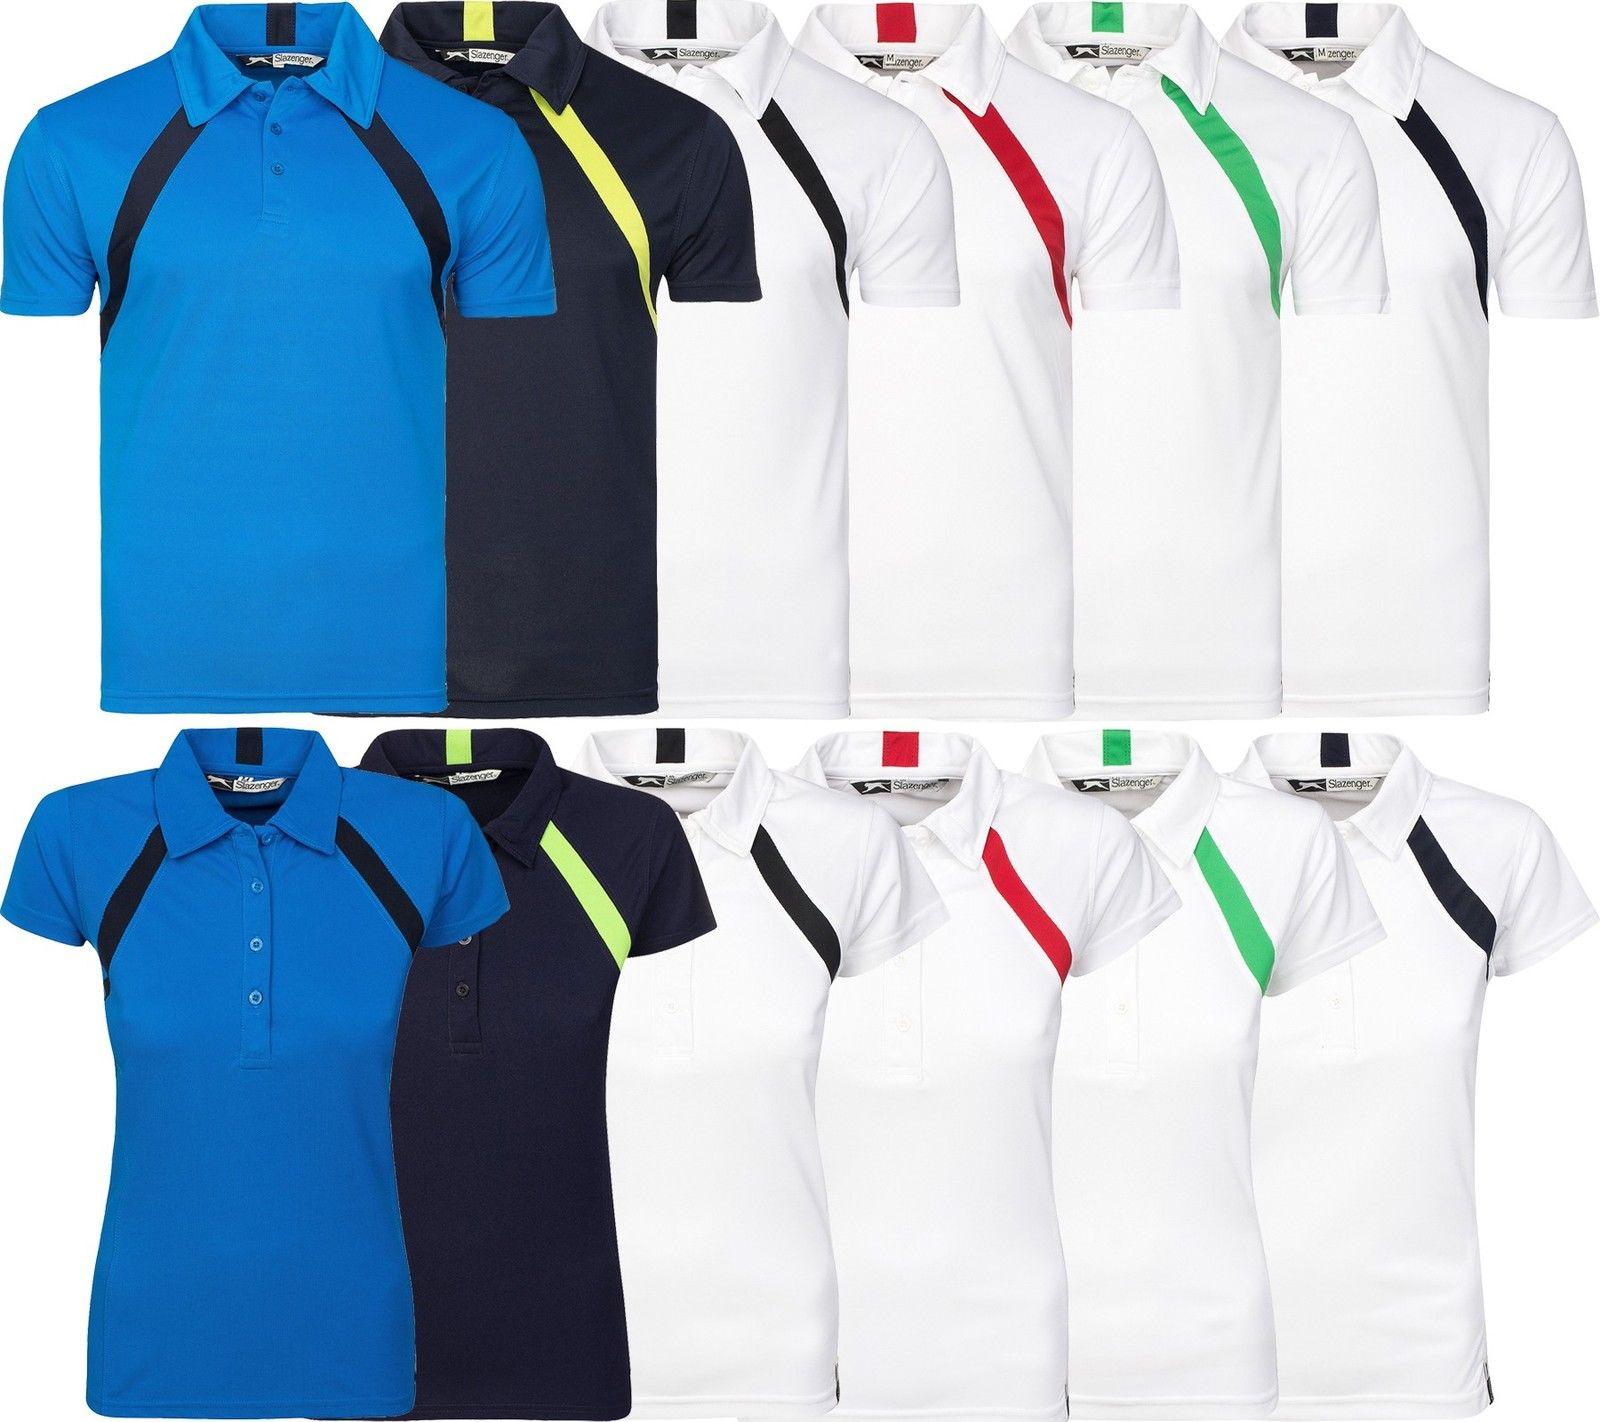 Slazenger Cool Fit Fitness Polos @eBayWOW @outlet46 #PARTNERLOOK